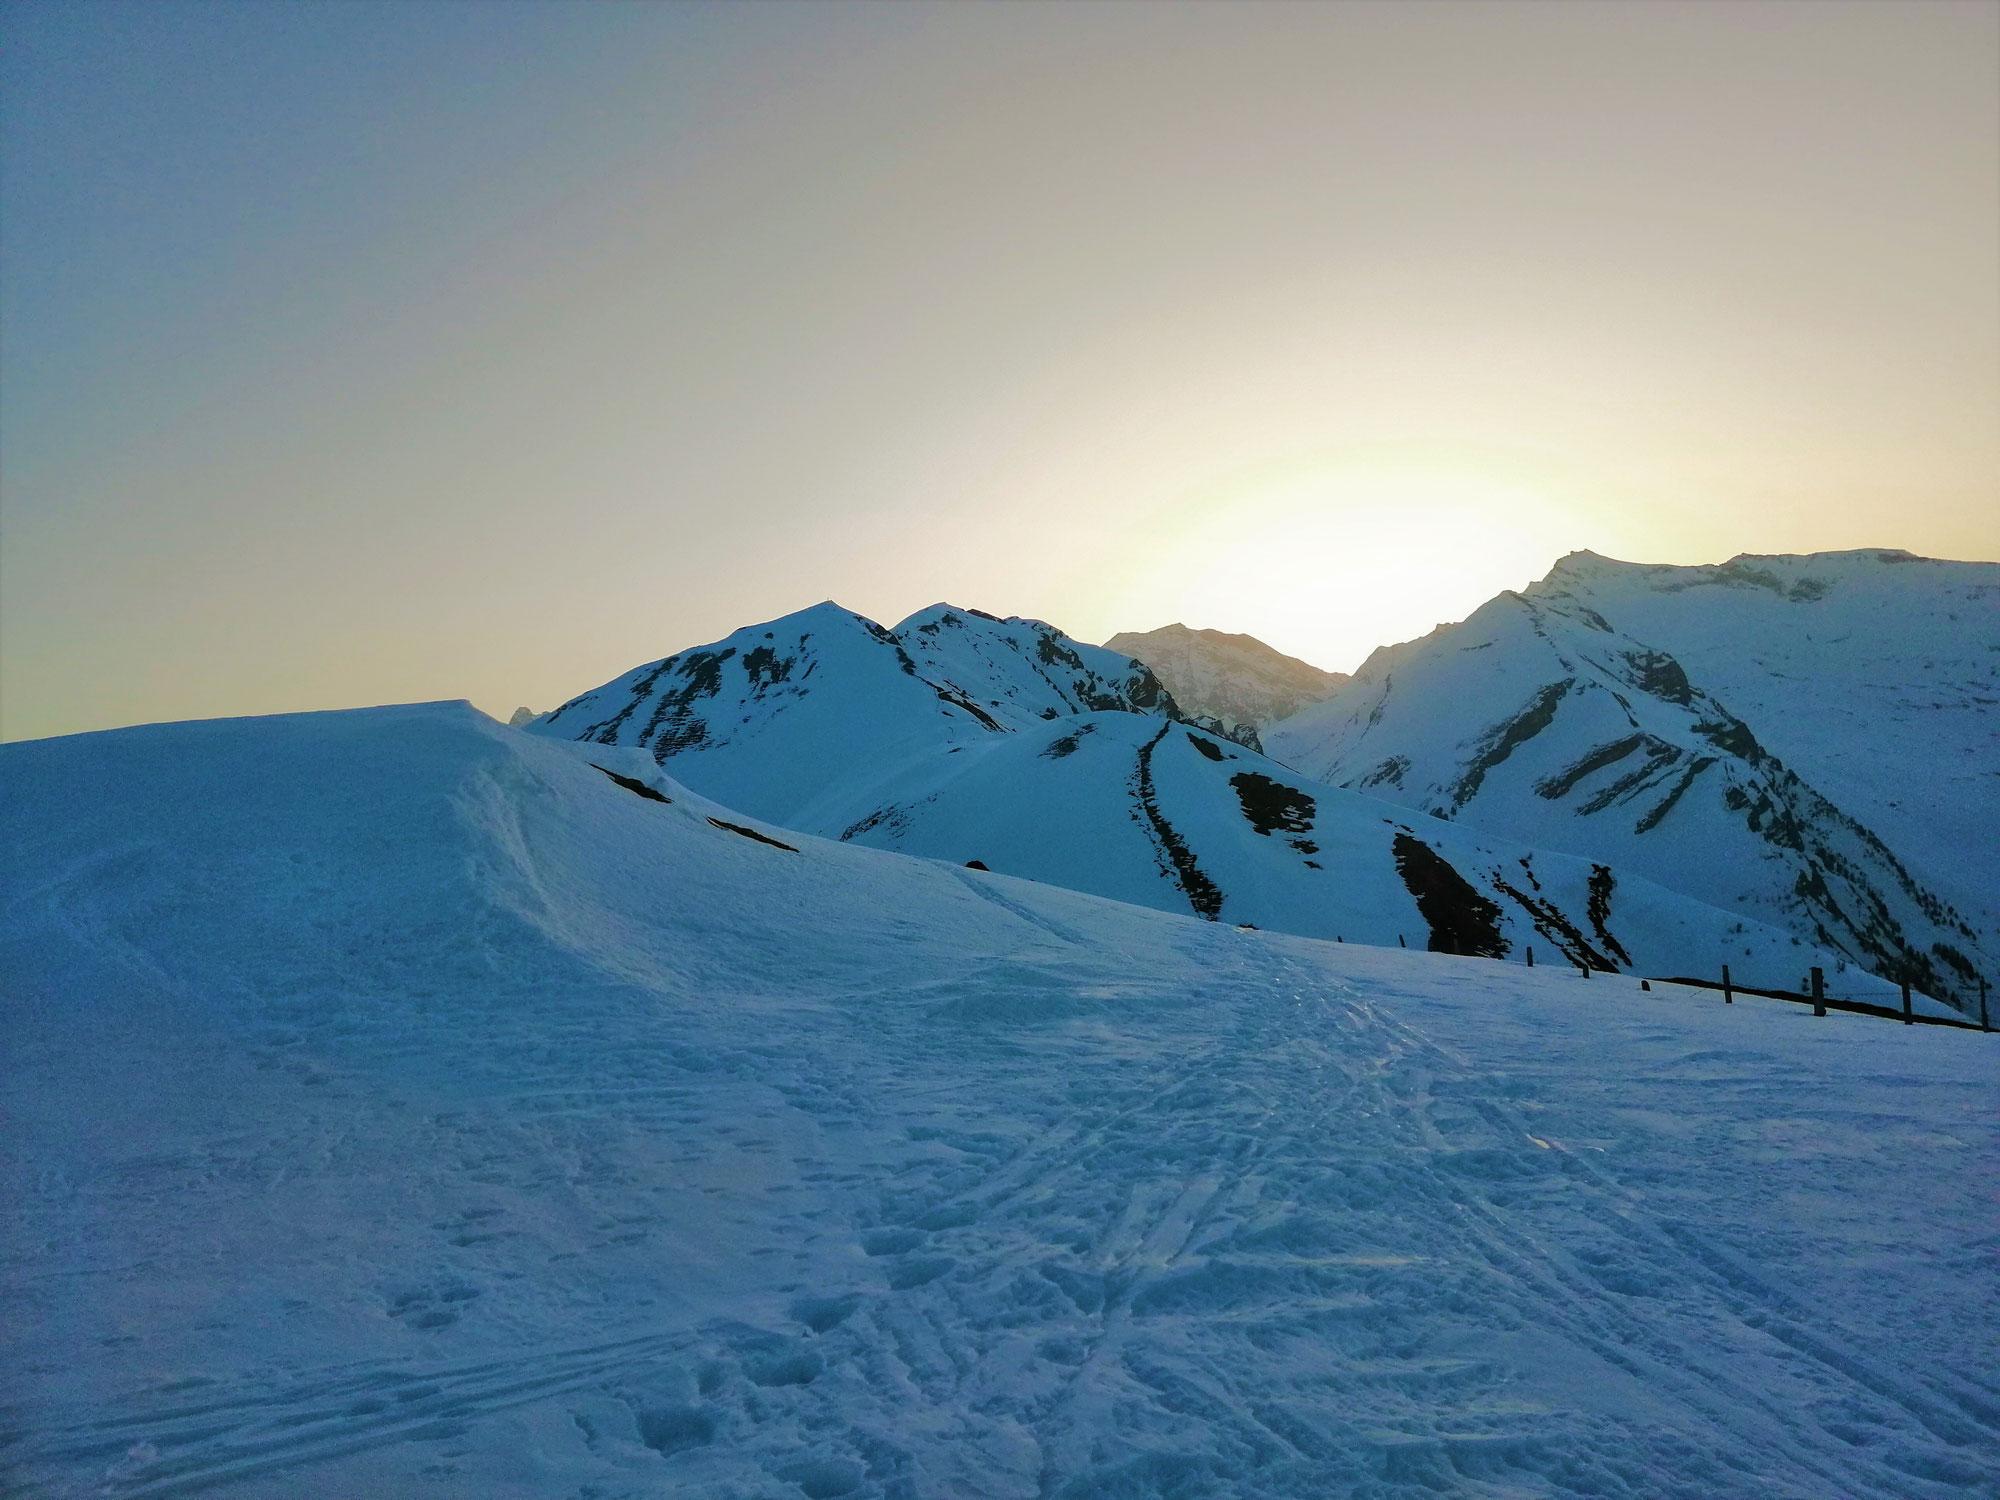 #775 Skitour Padauner Berg